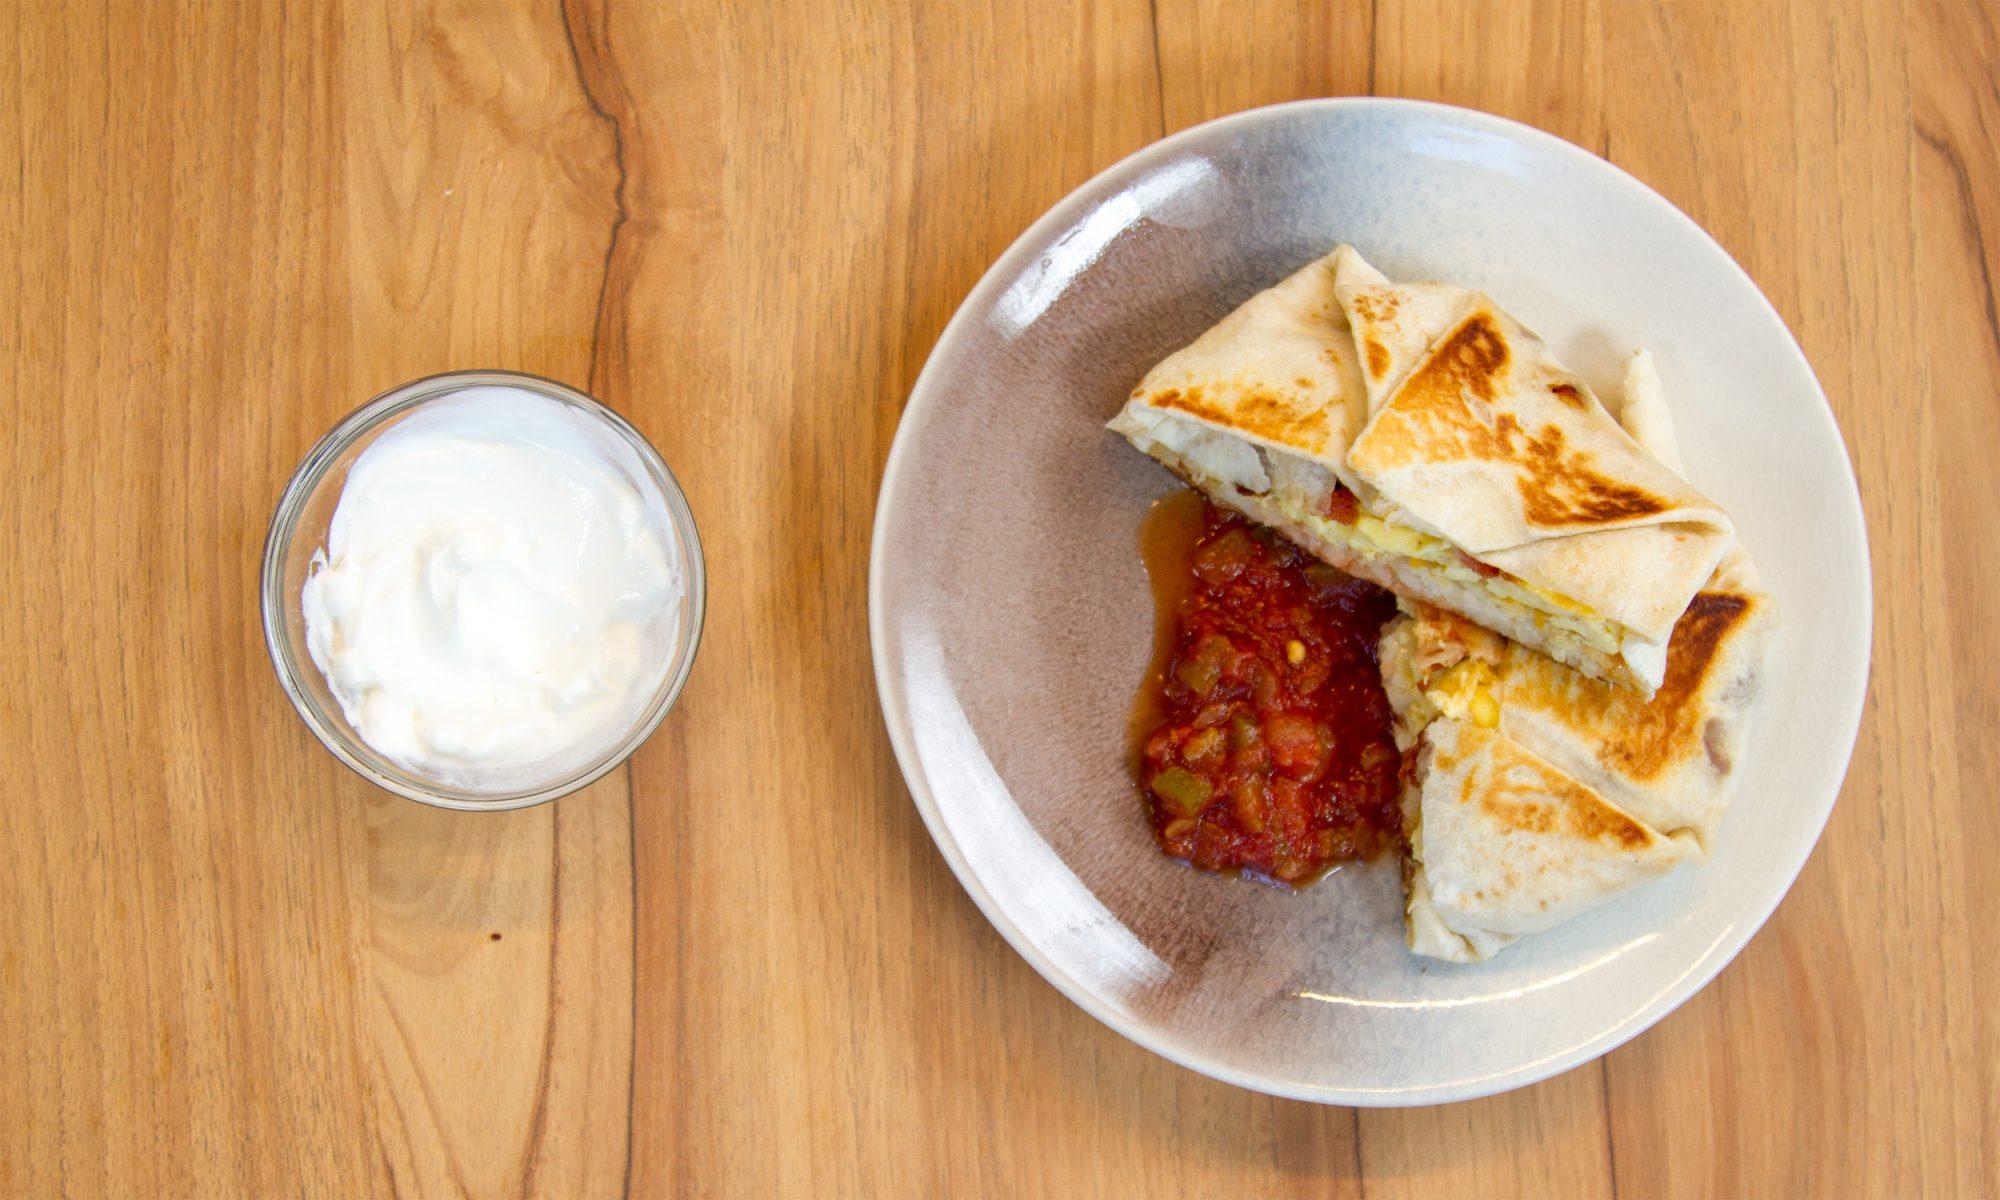 EC: This Copycat Taco Bell Breakfast Crunchwrap Tastes Like a Teenage Dream